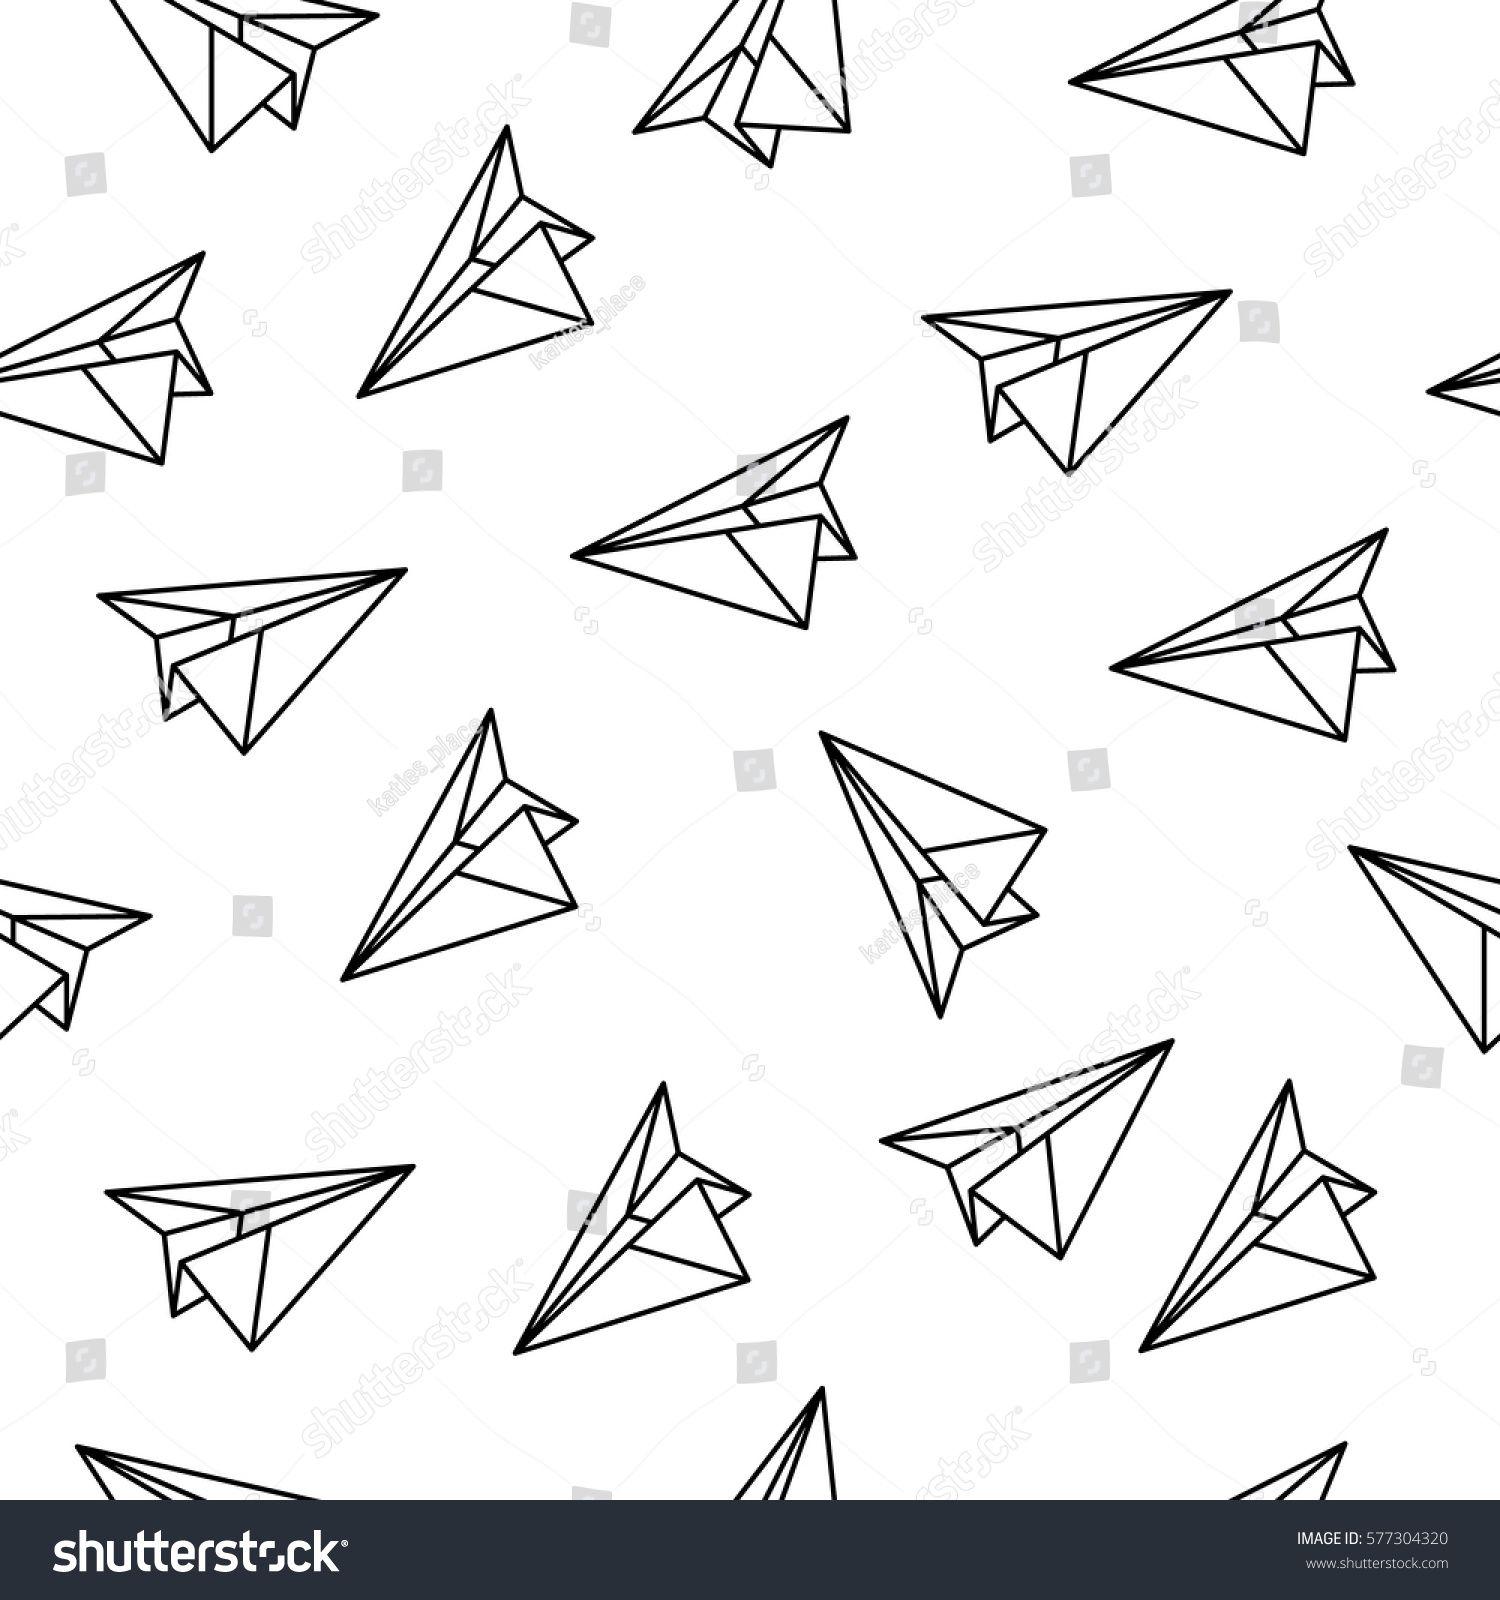 stockvectorseamlesspatternwithorigamiplanespaper